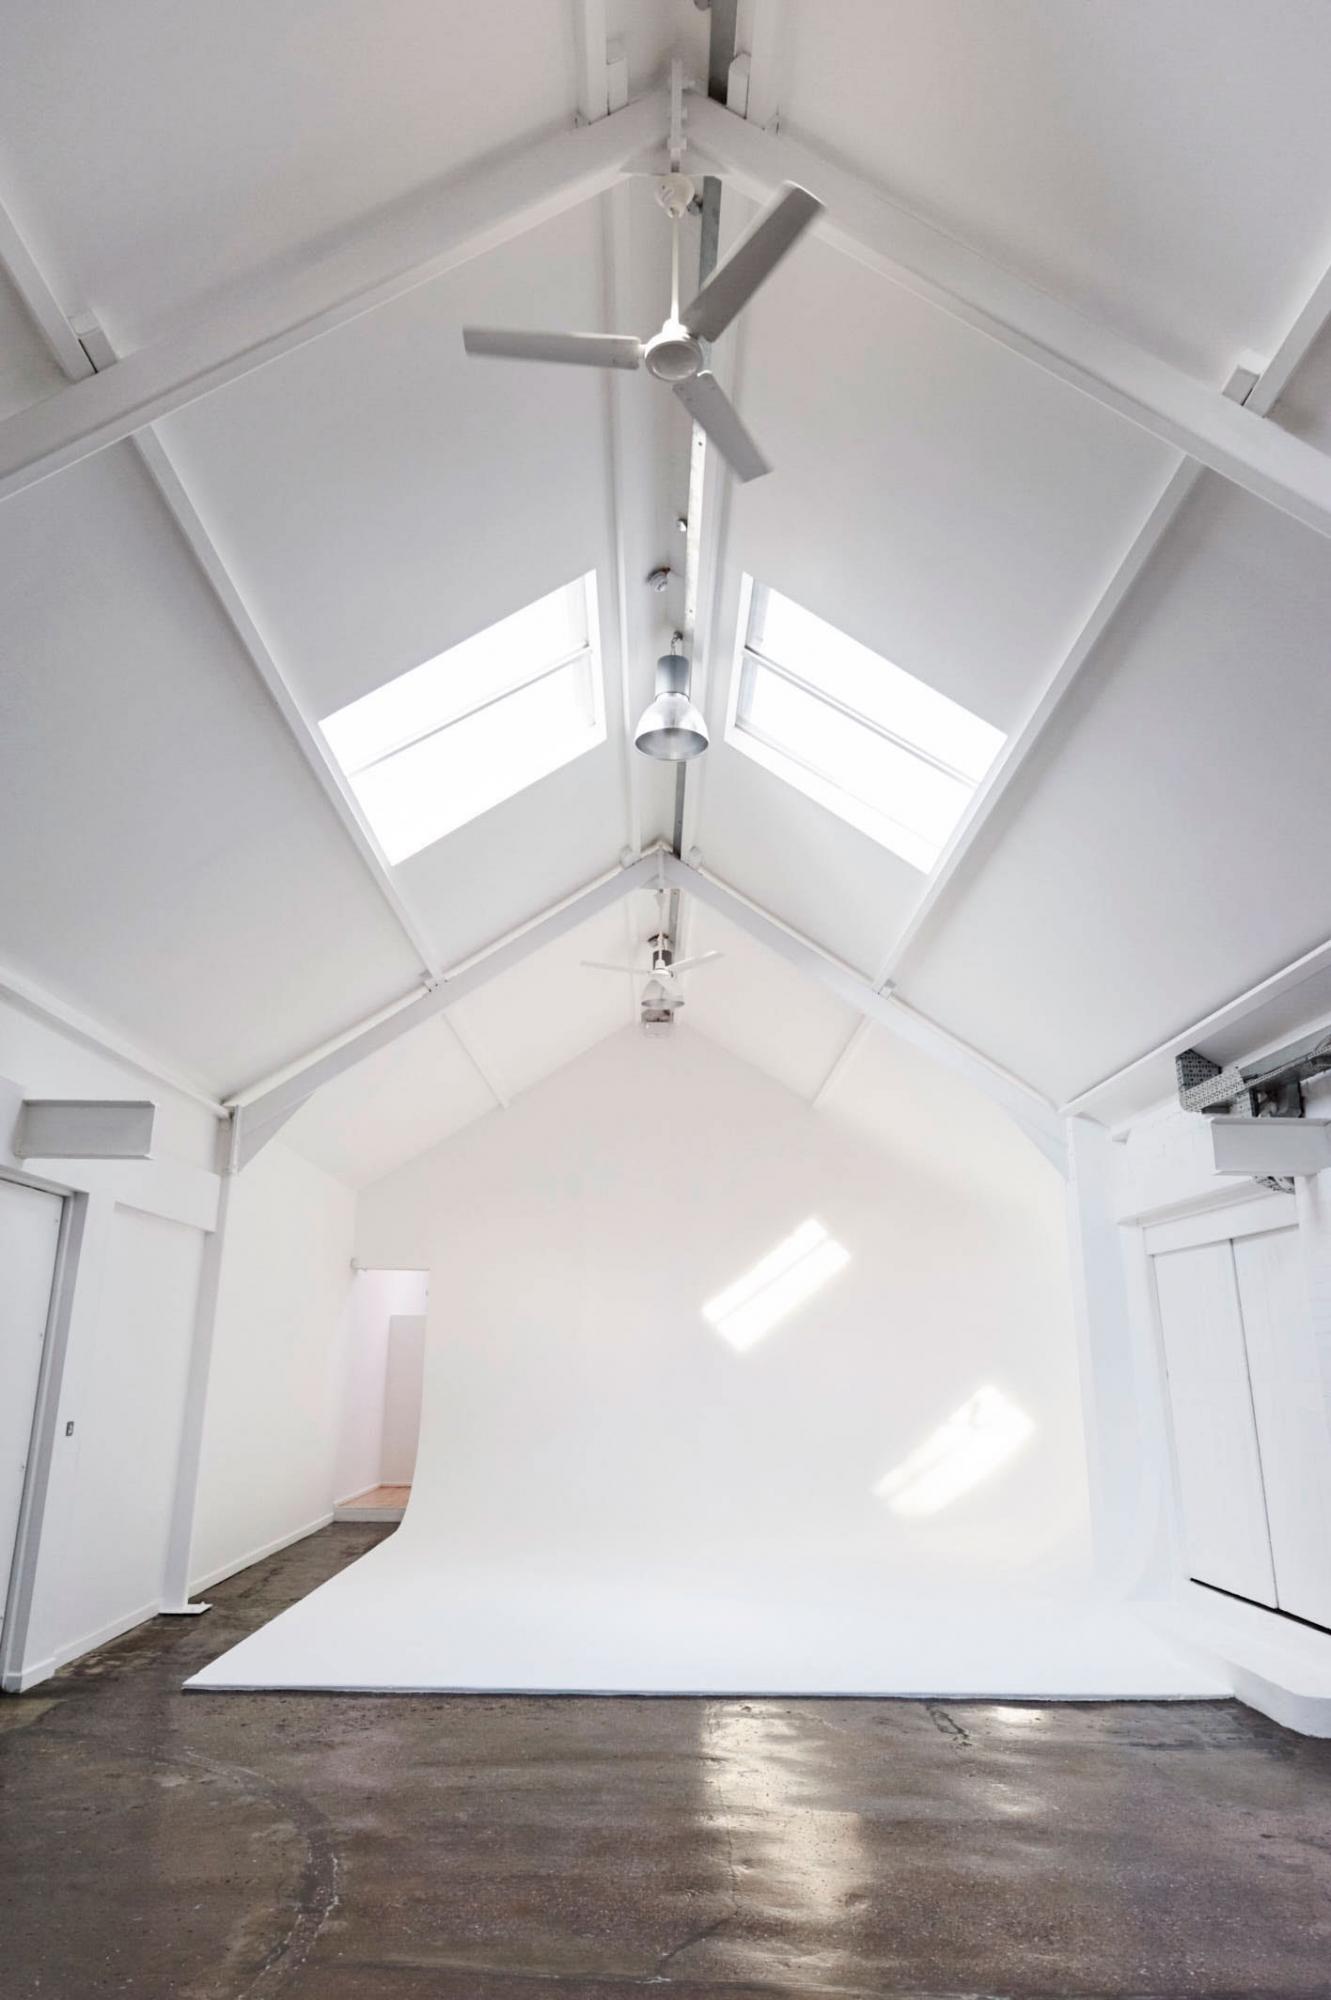 fivefourstudios Studio One